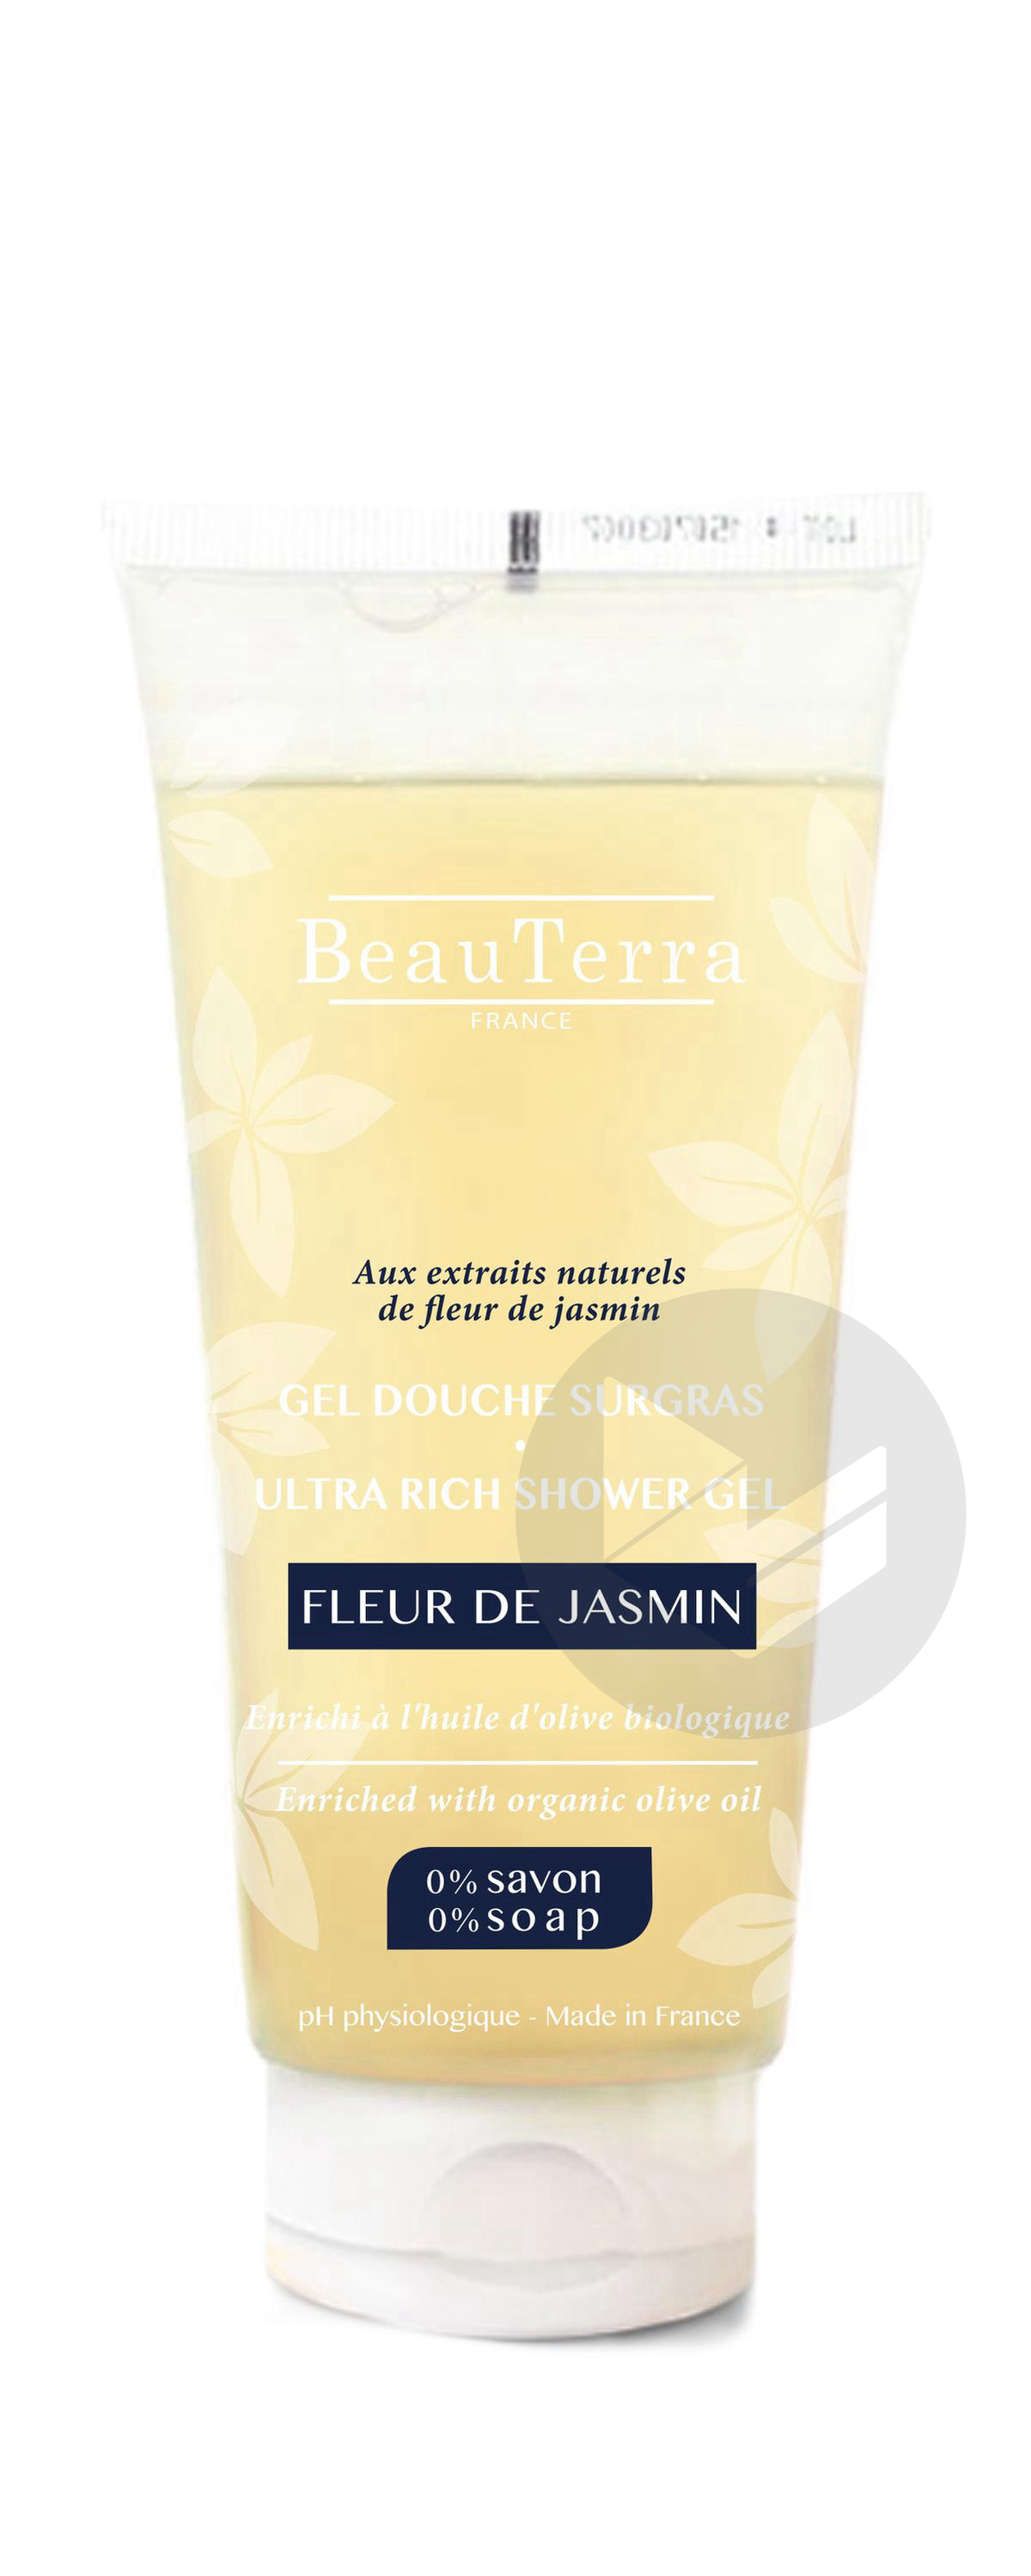 Gel Douche Surgras Fleur De Jasmin 100 Ml